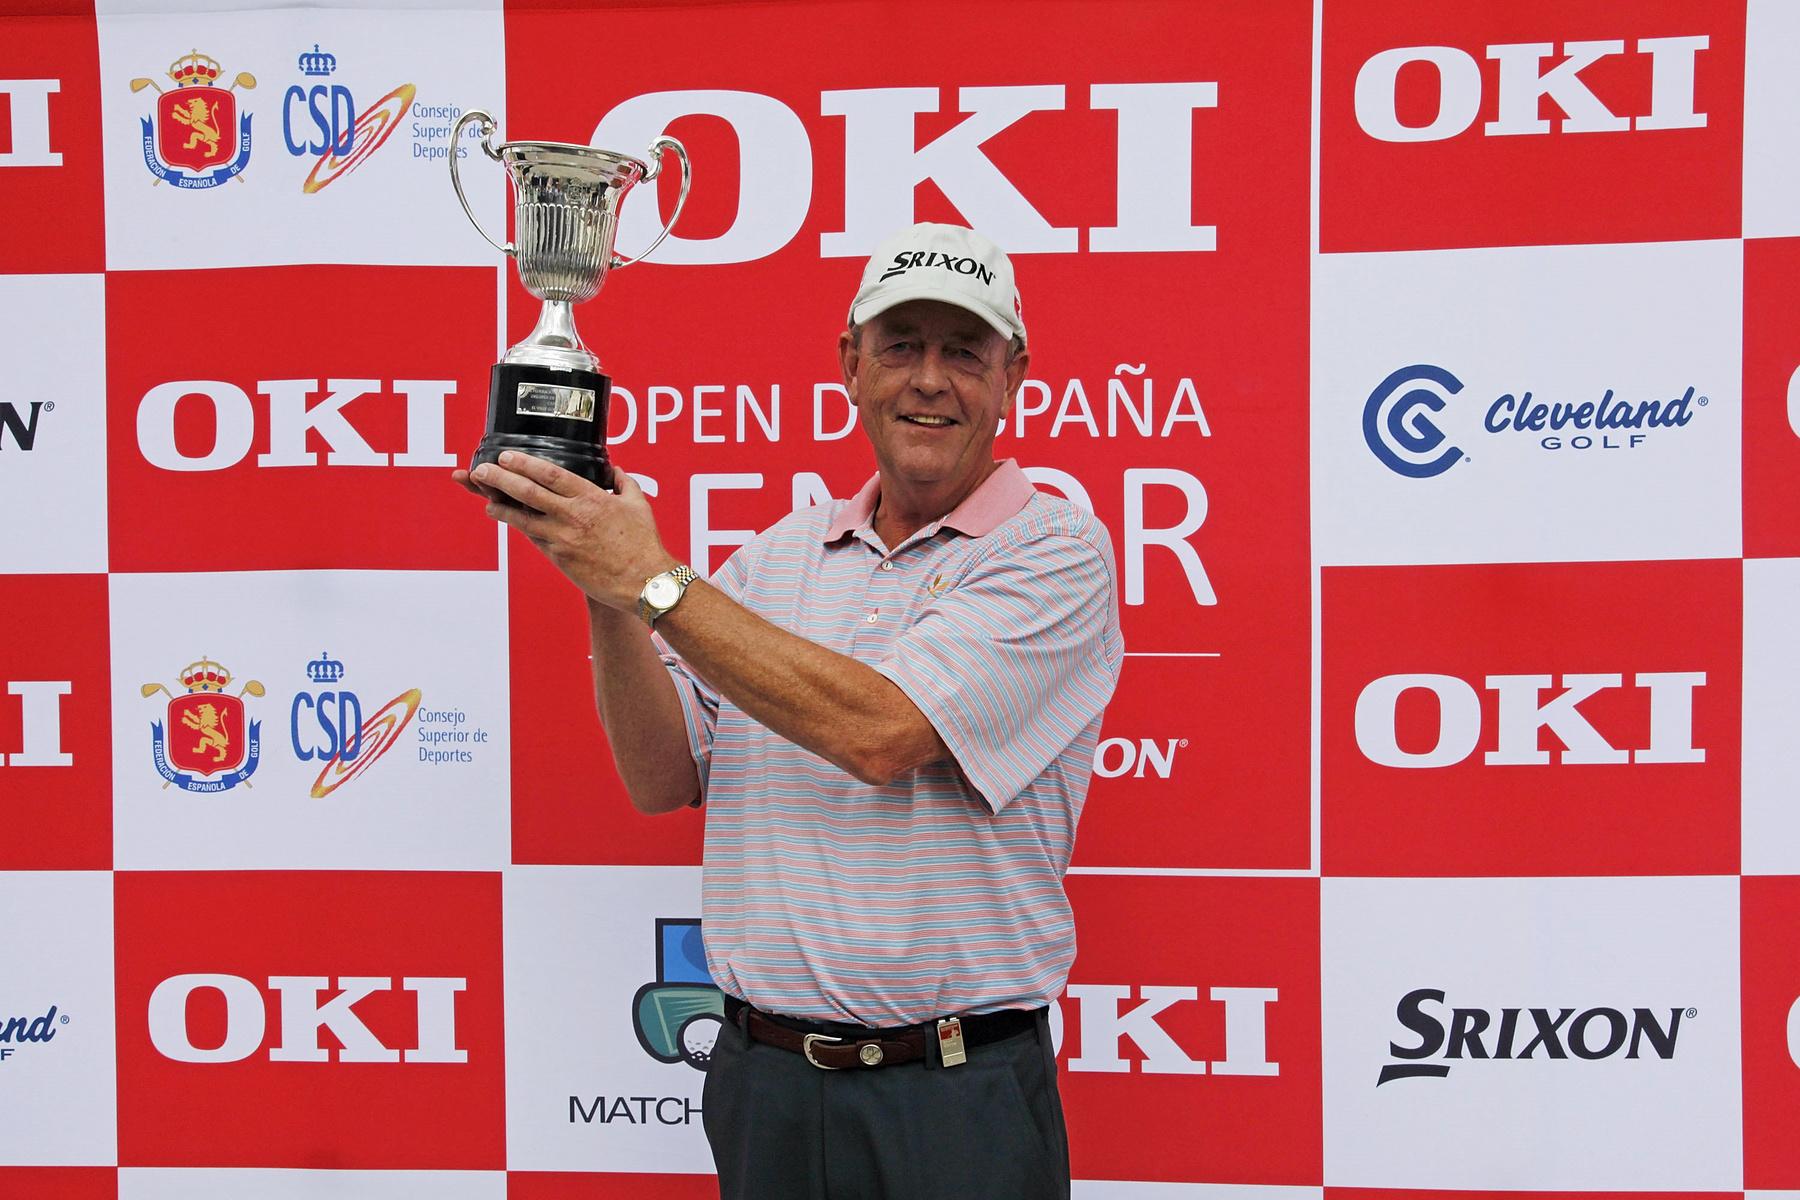 OKI Open de Espana Senior by Cleveland Golf/Srixon – Round Three